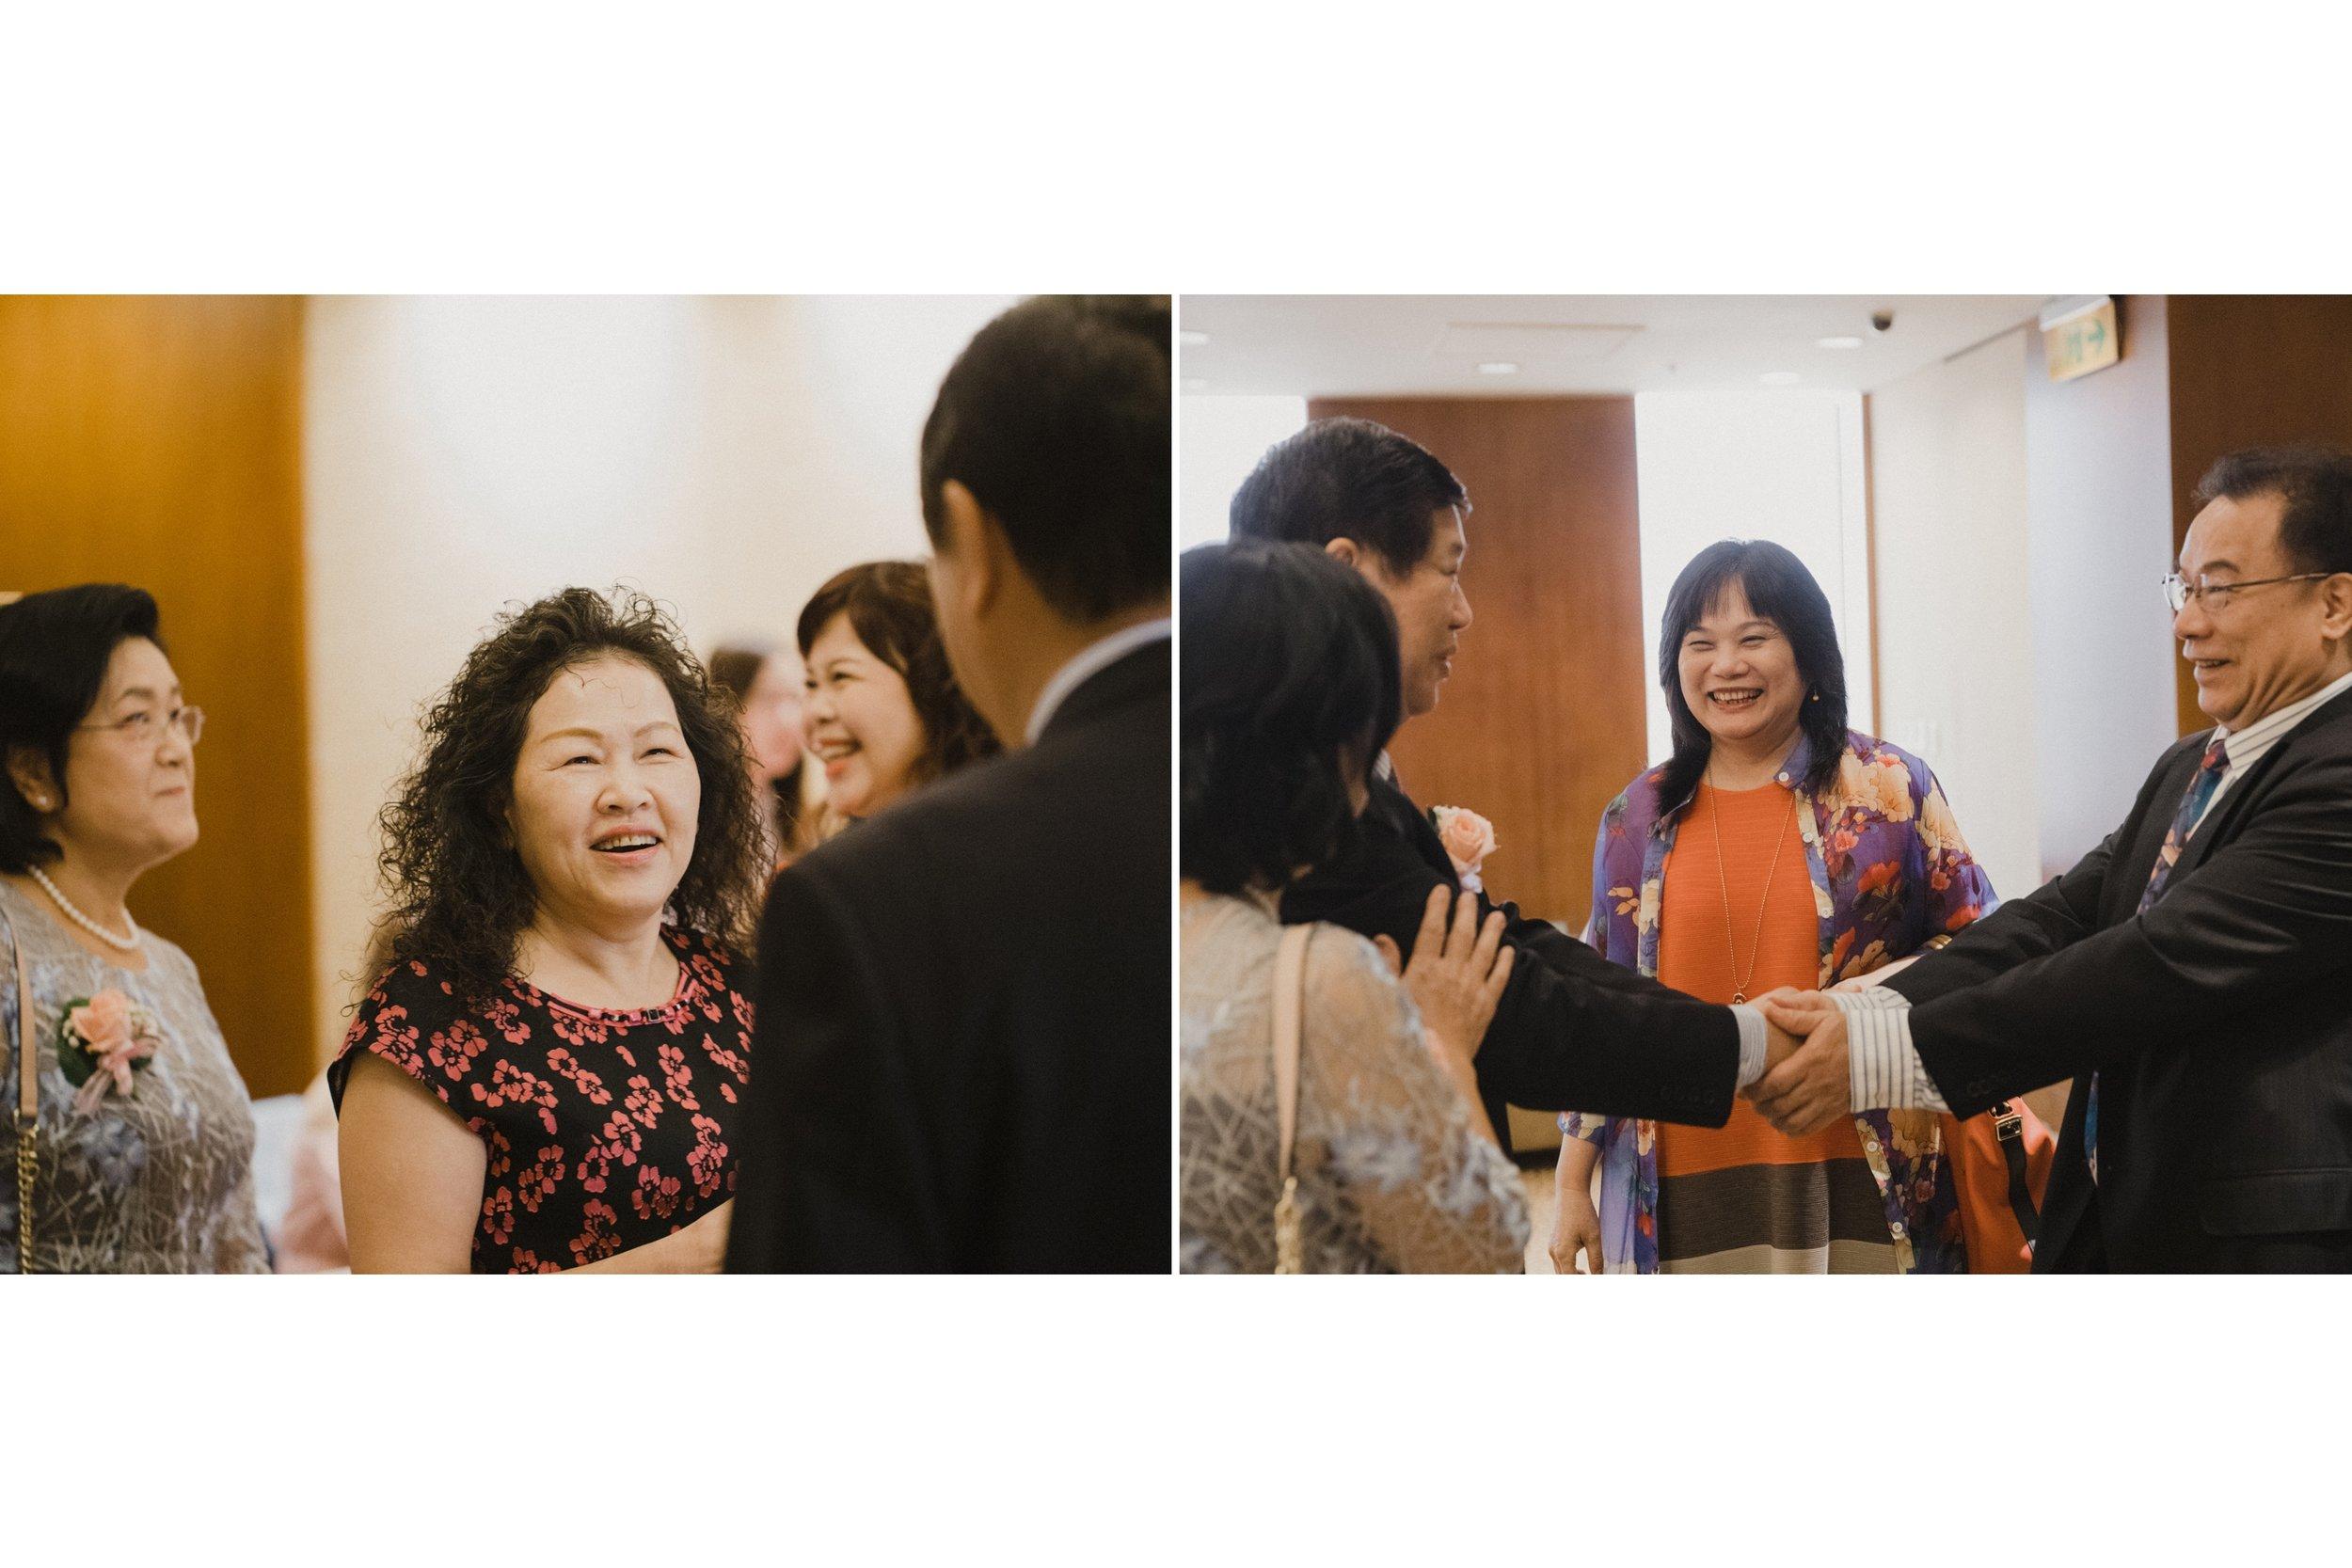 wedding-caridee-oscar-lunch-ambassador-hsinchu-結婚午宴-新竹國賓_44.jpg